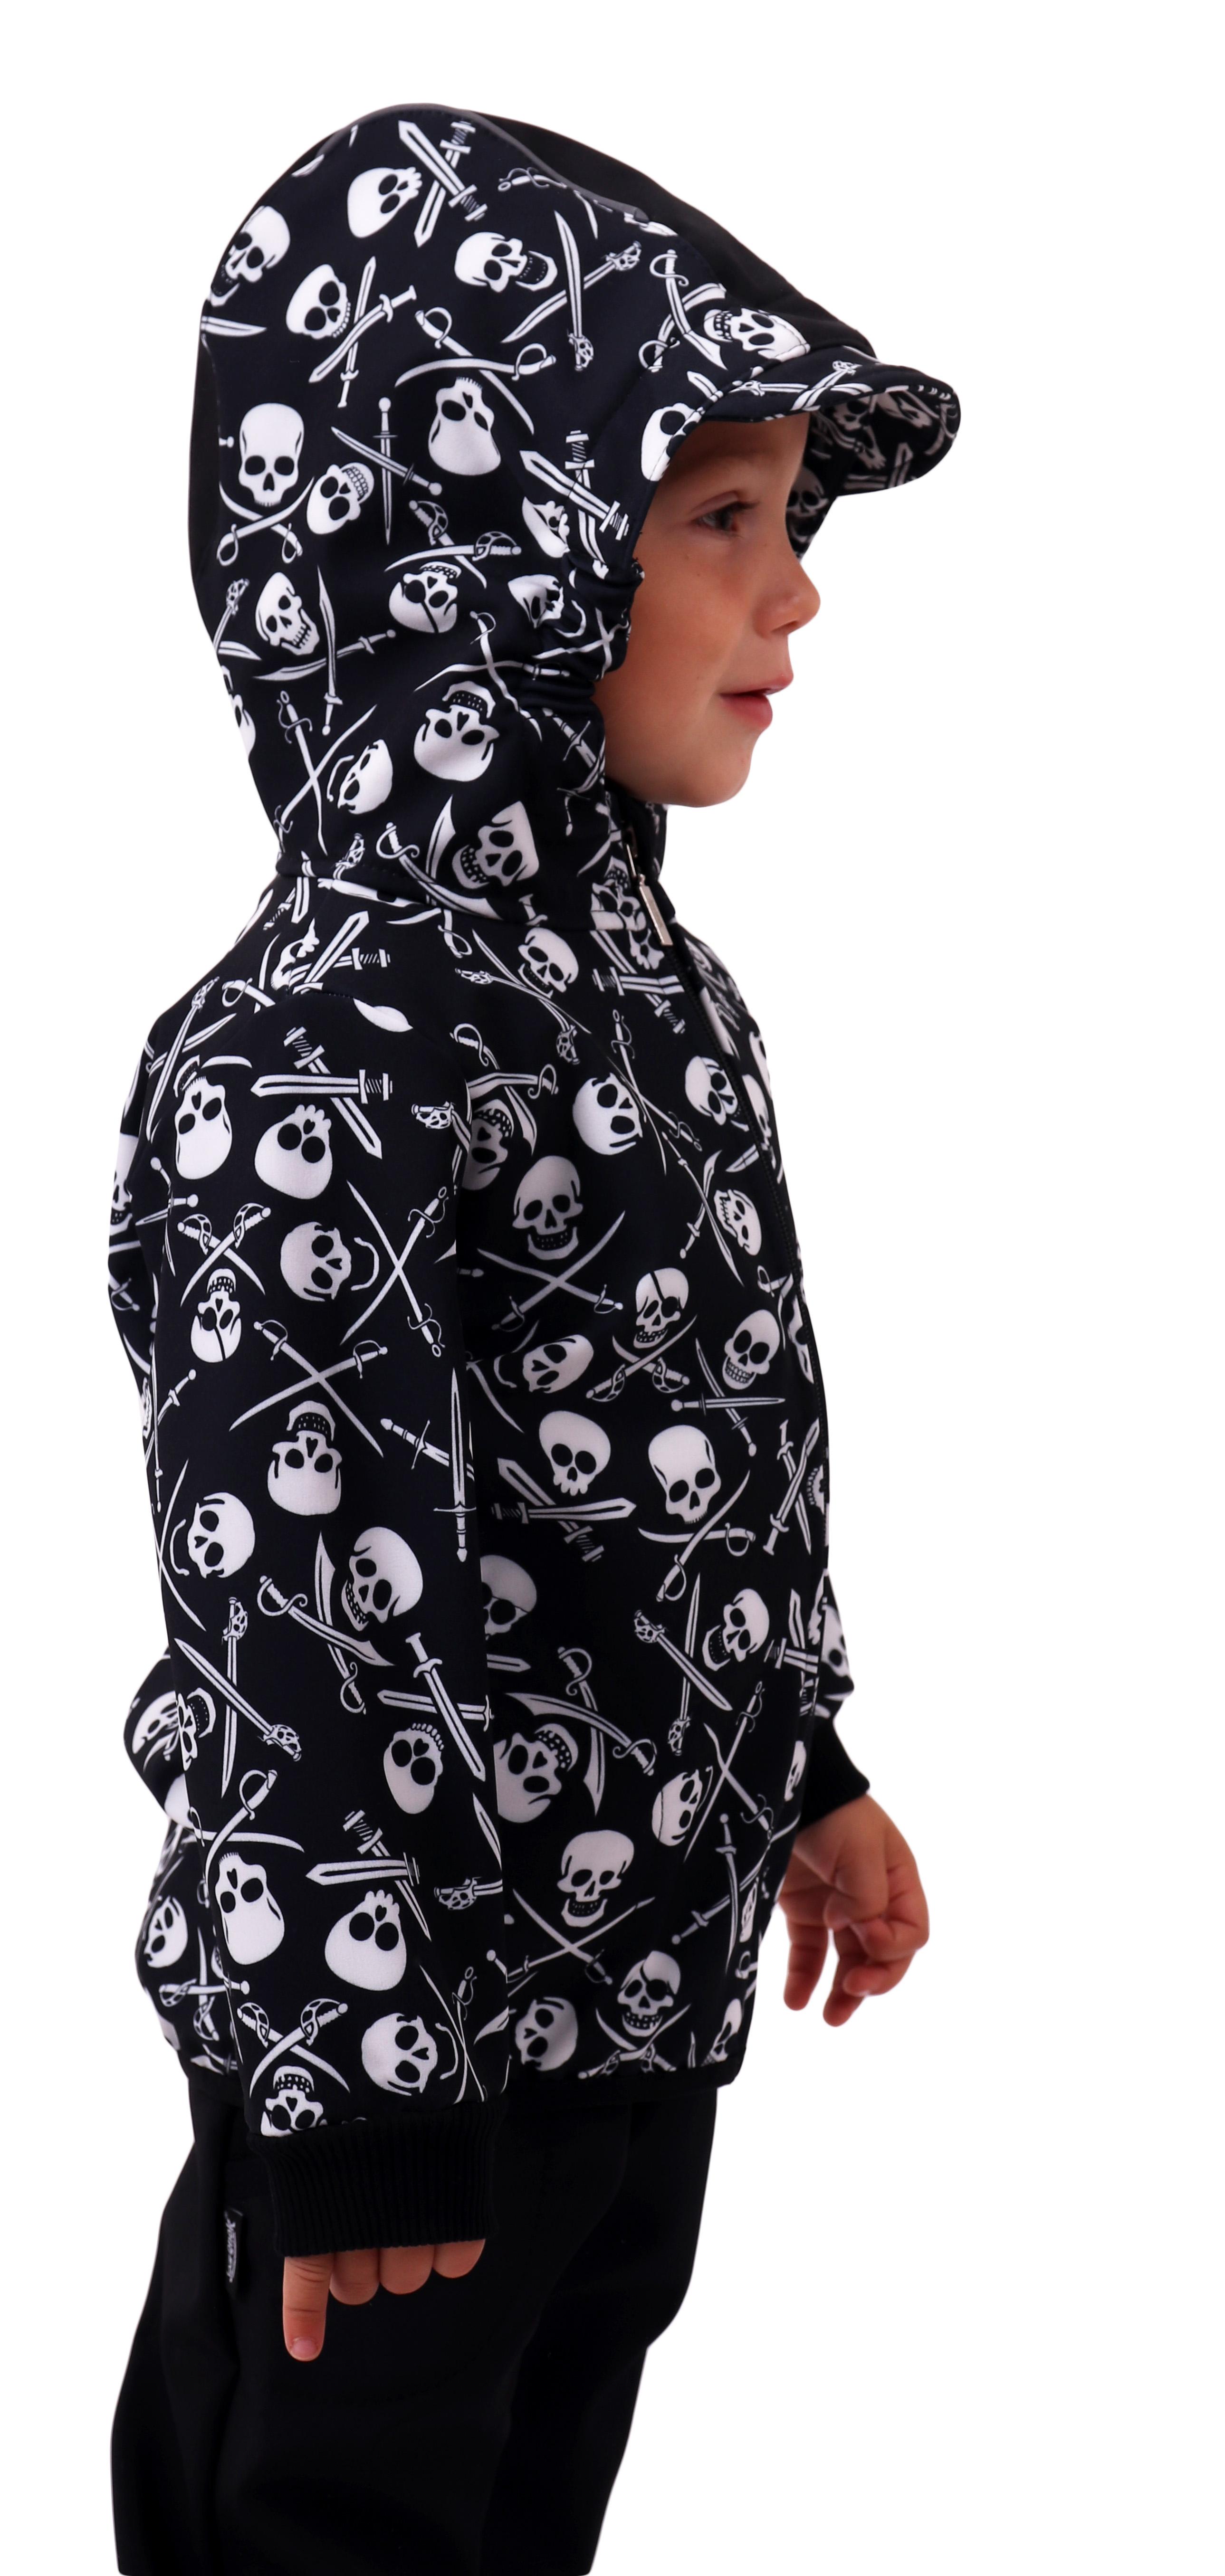 Dětská softshellová bunda, pirátské lebky, 128